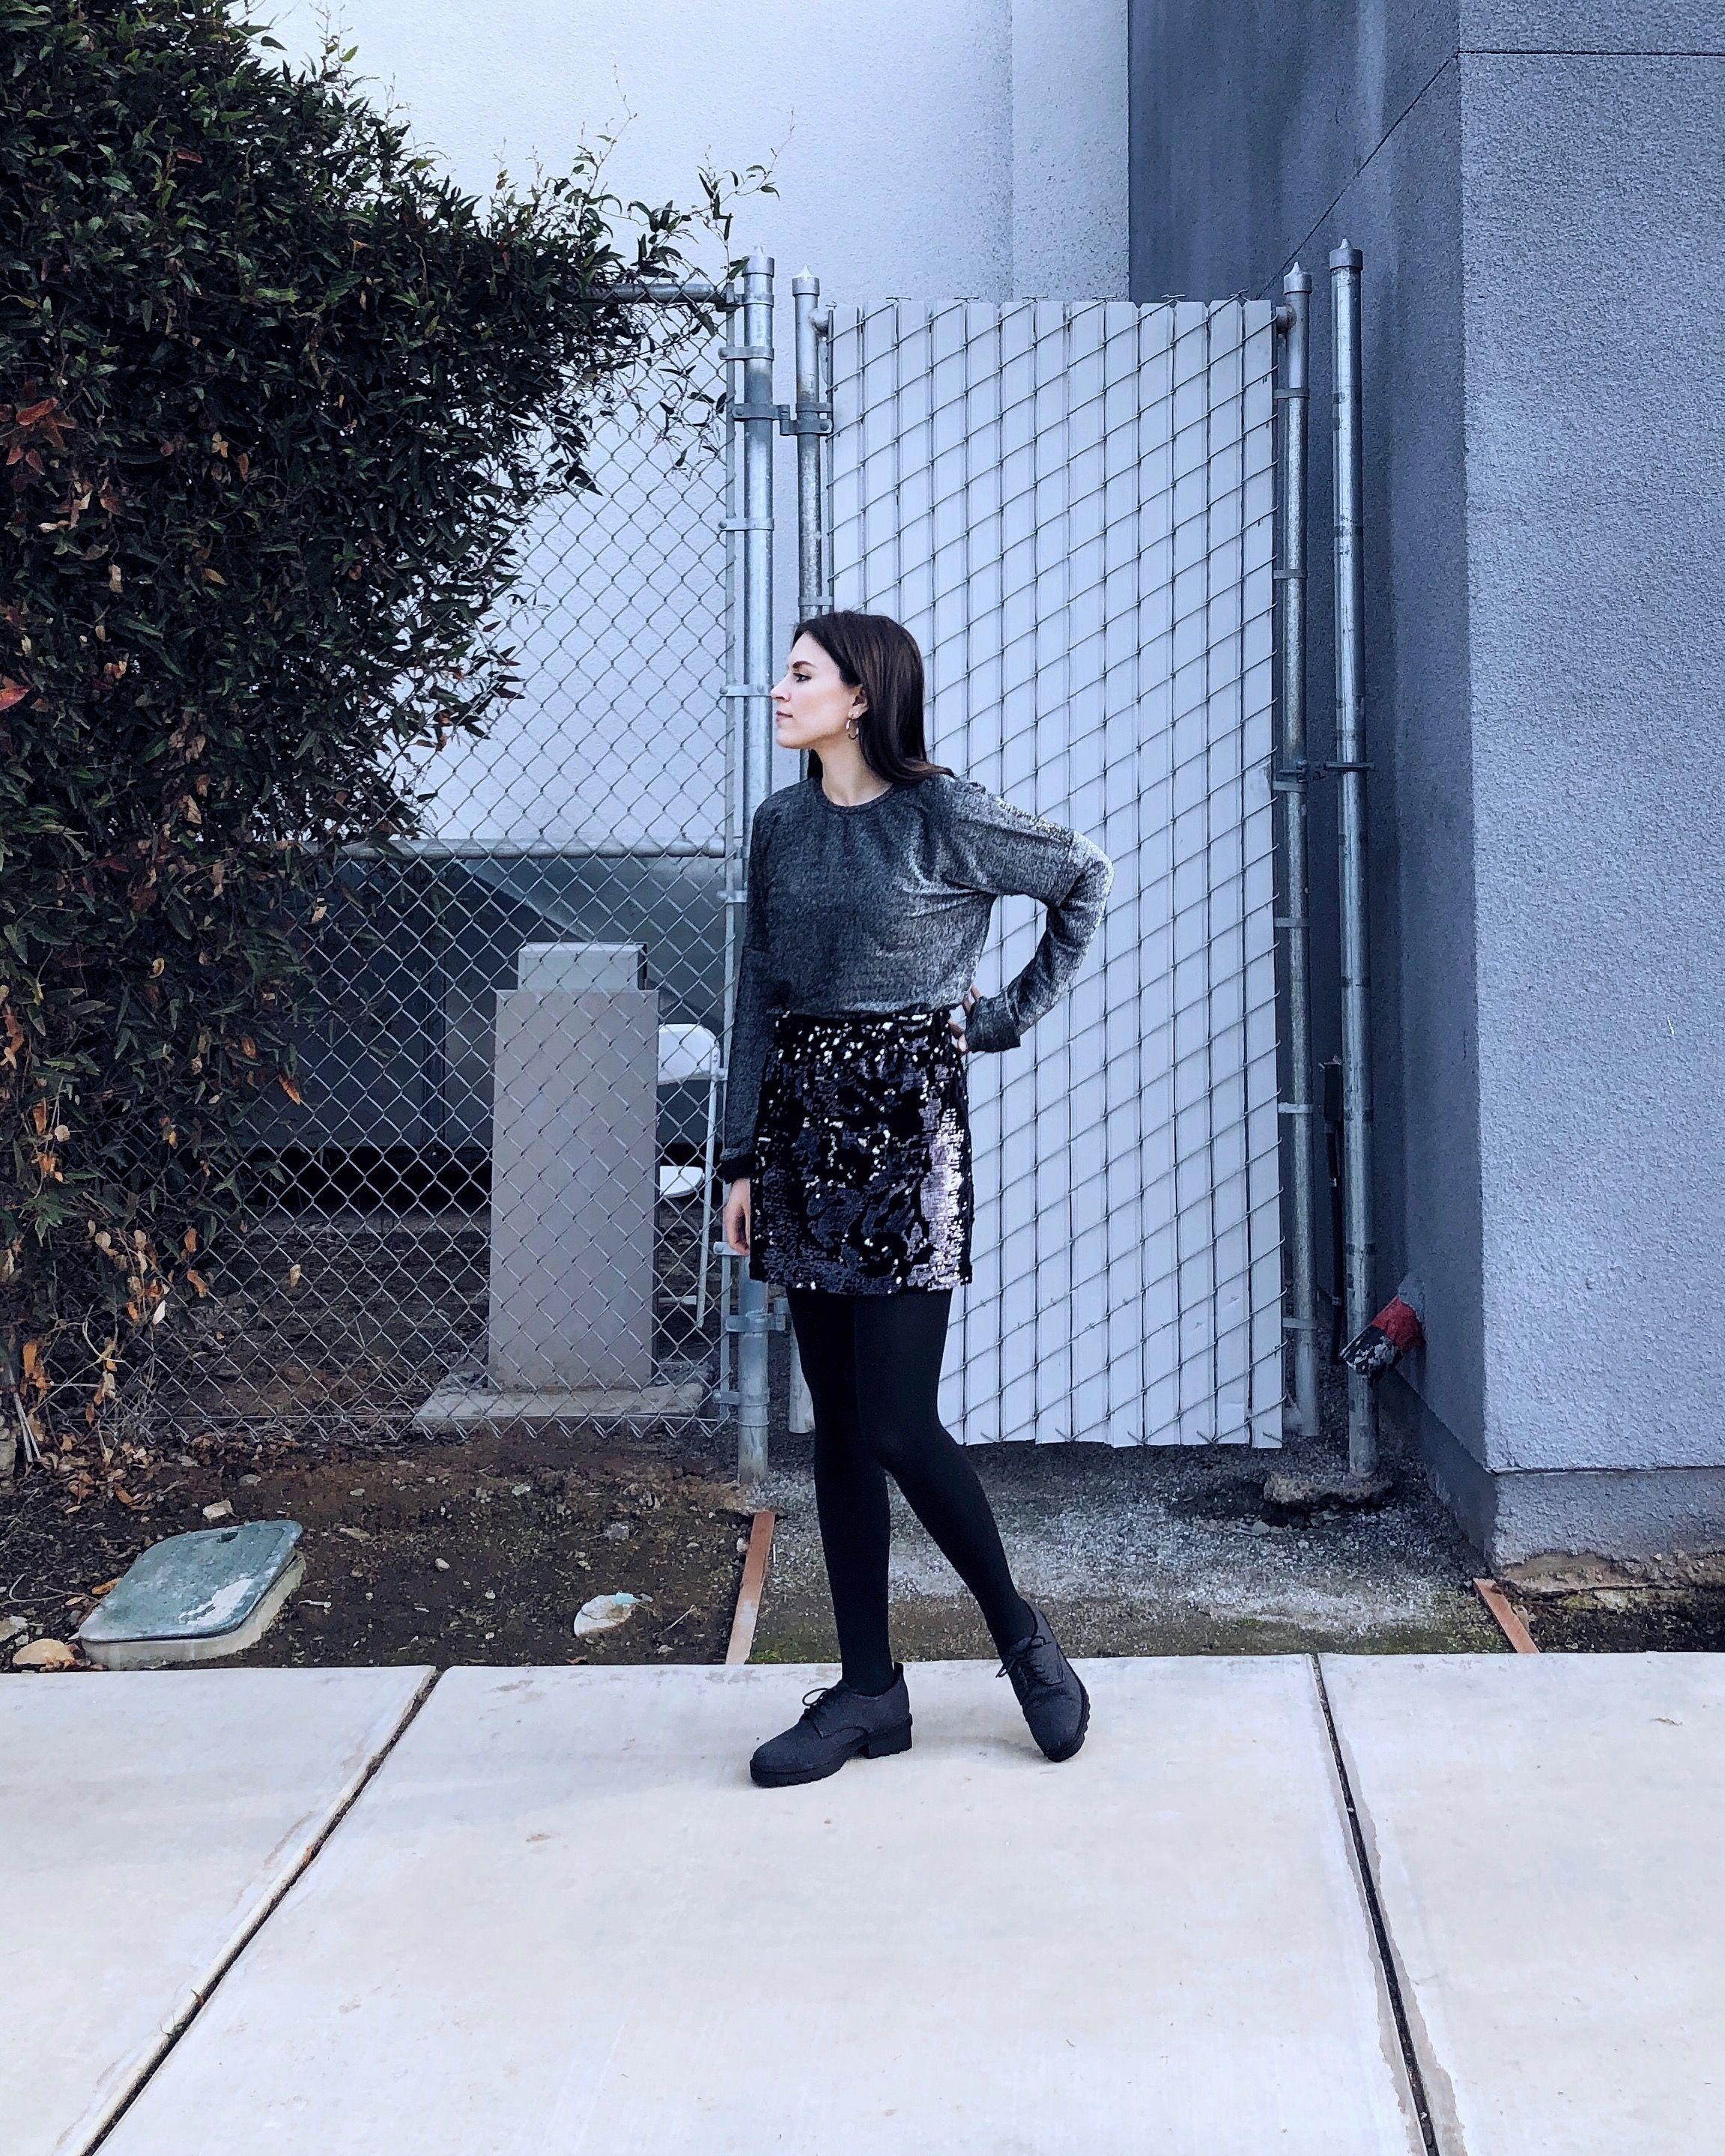 Sequin Mini Photo And Video Instagram Photo Sequin Mini